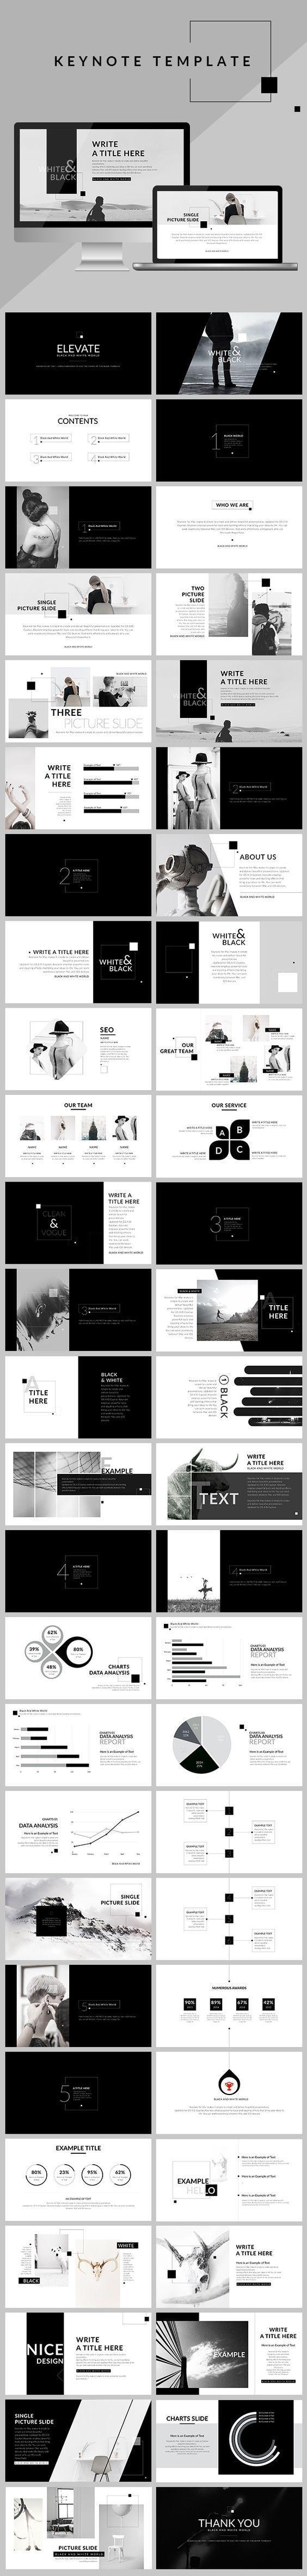 Resume infographic Black & White Clean Keynote